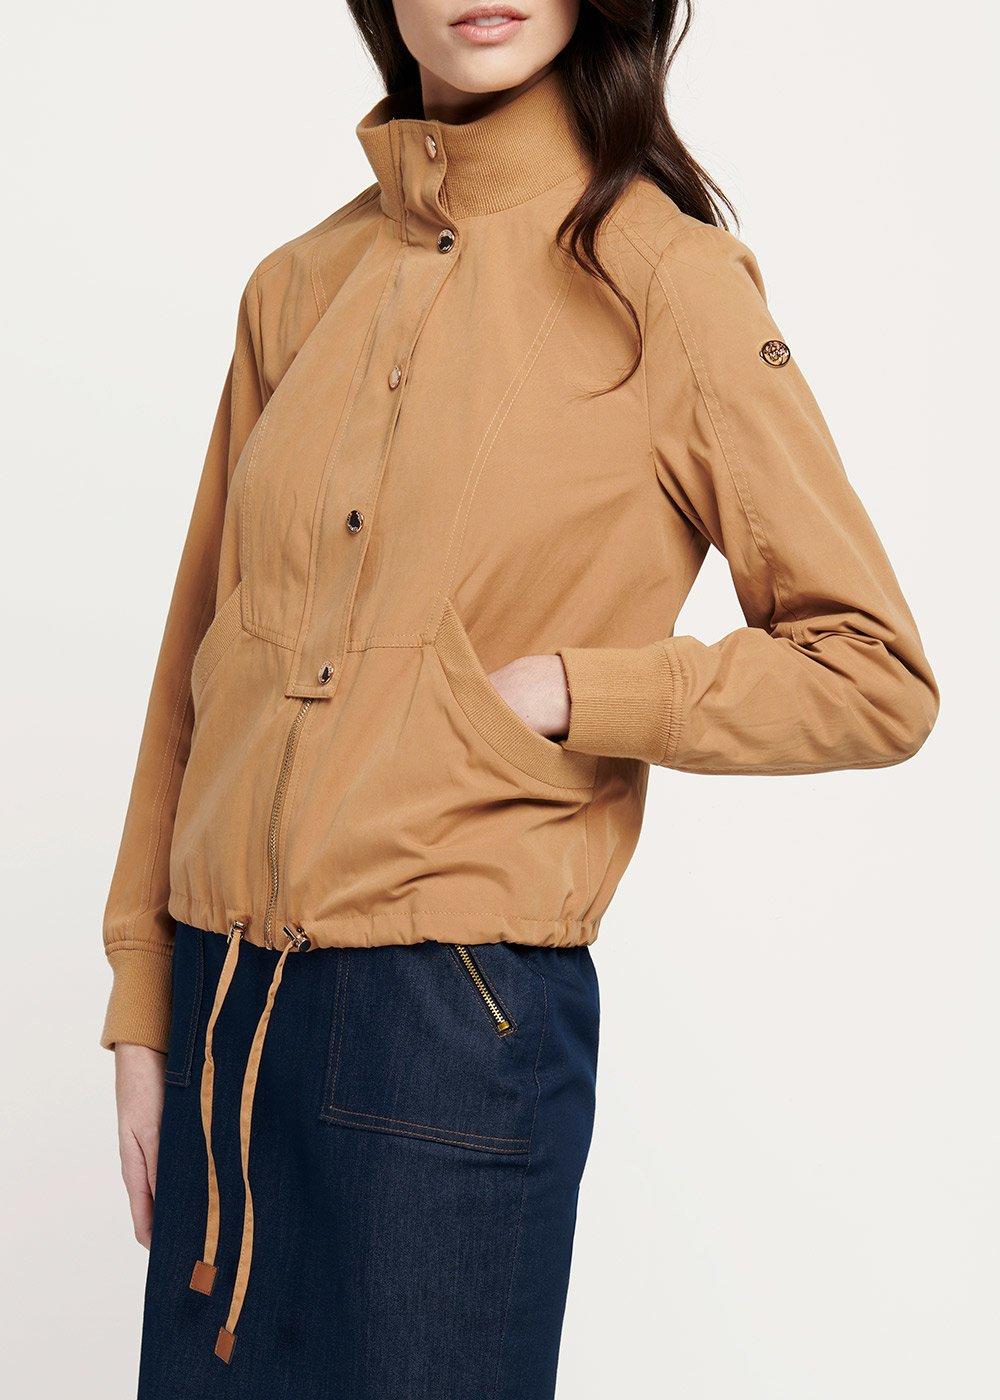 Garret jacket in tobacco-coloured cotton